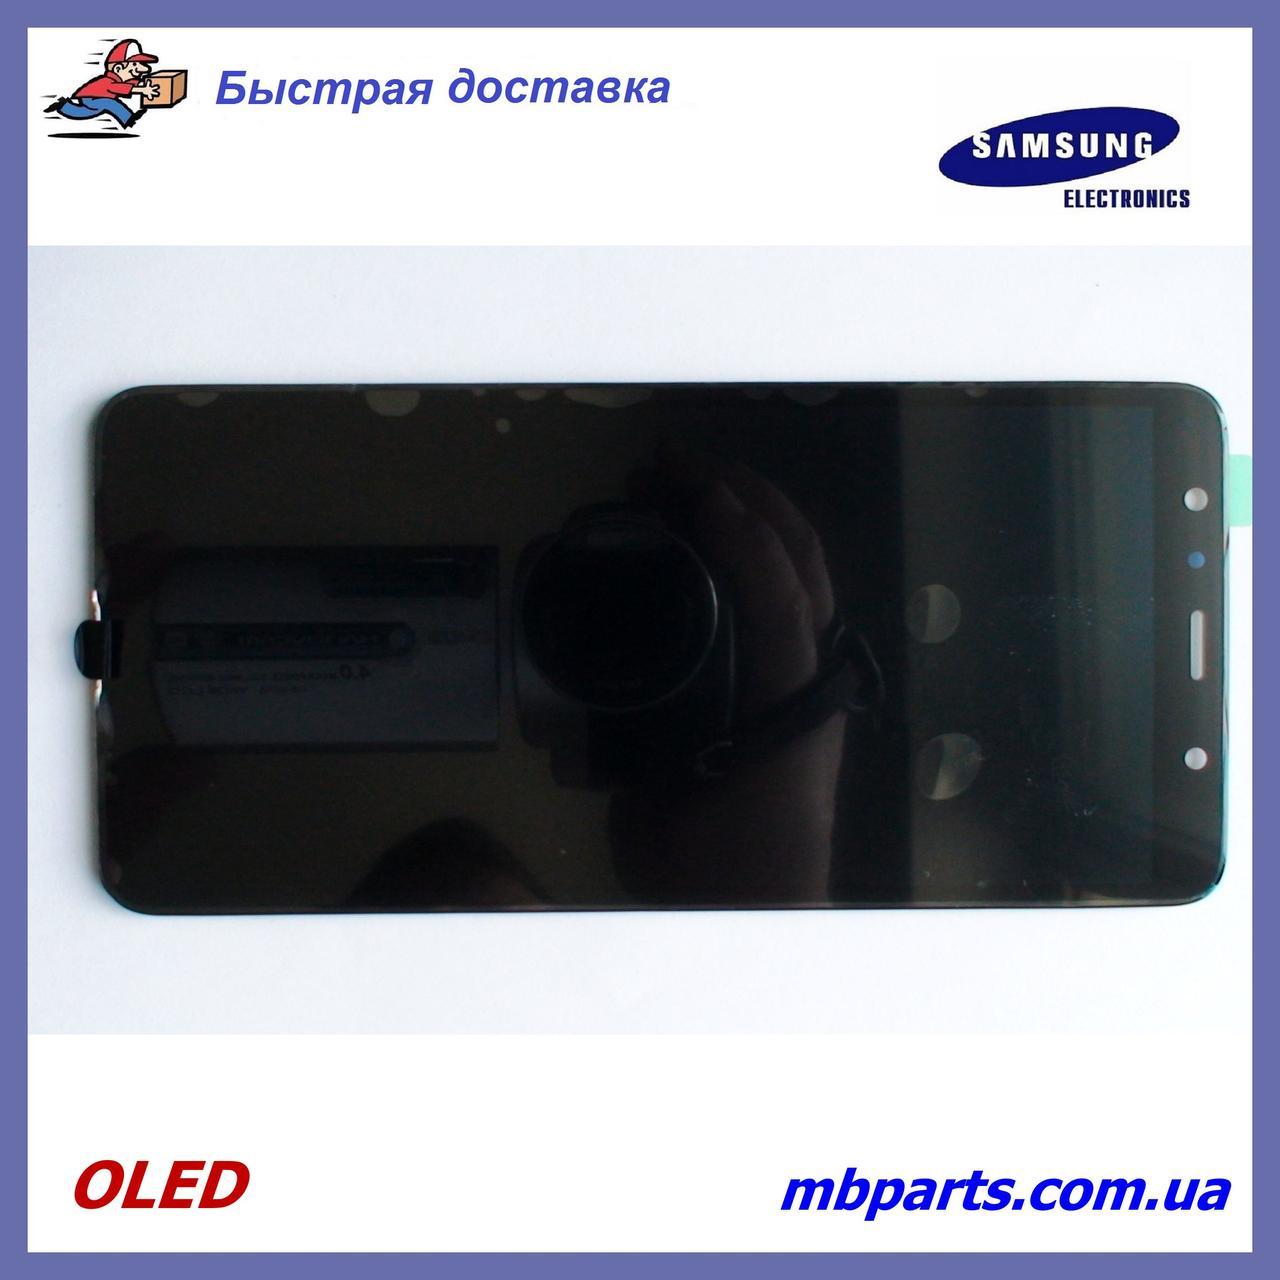 Дисплей з сенсором Samsung A750 Galaxy A7 2018 OLED Black!